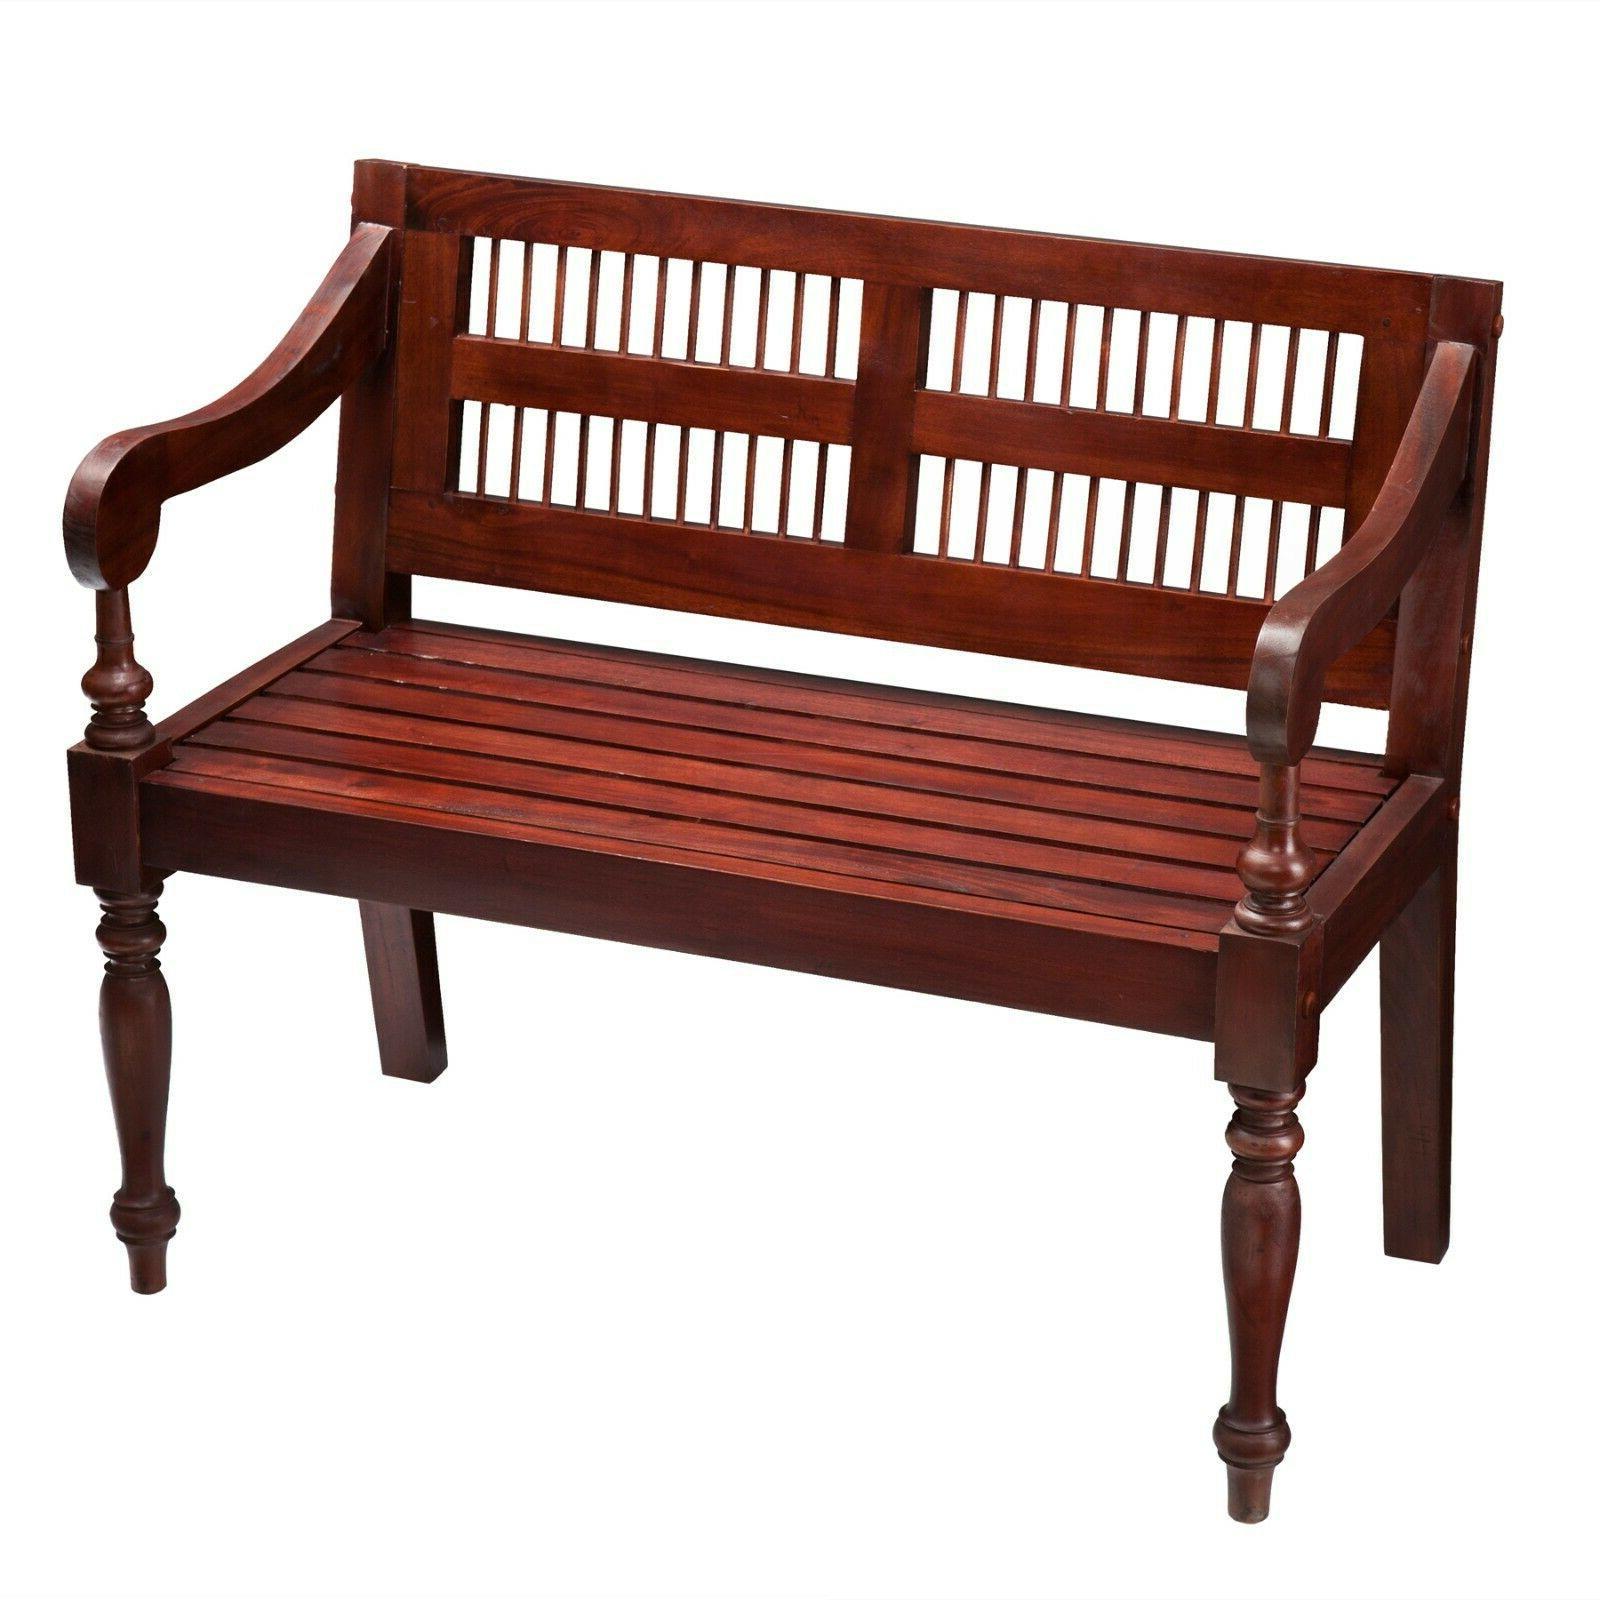 Wooden Indoor Mahogany Finish Seat Traditional Entryway